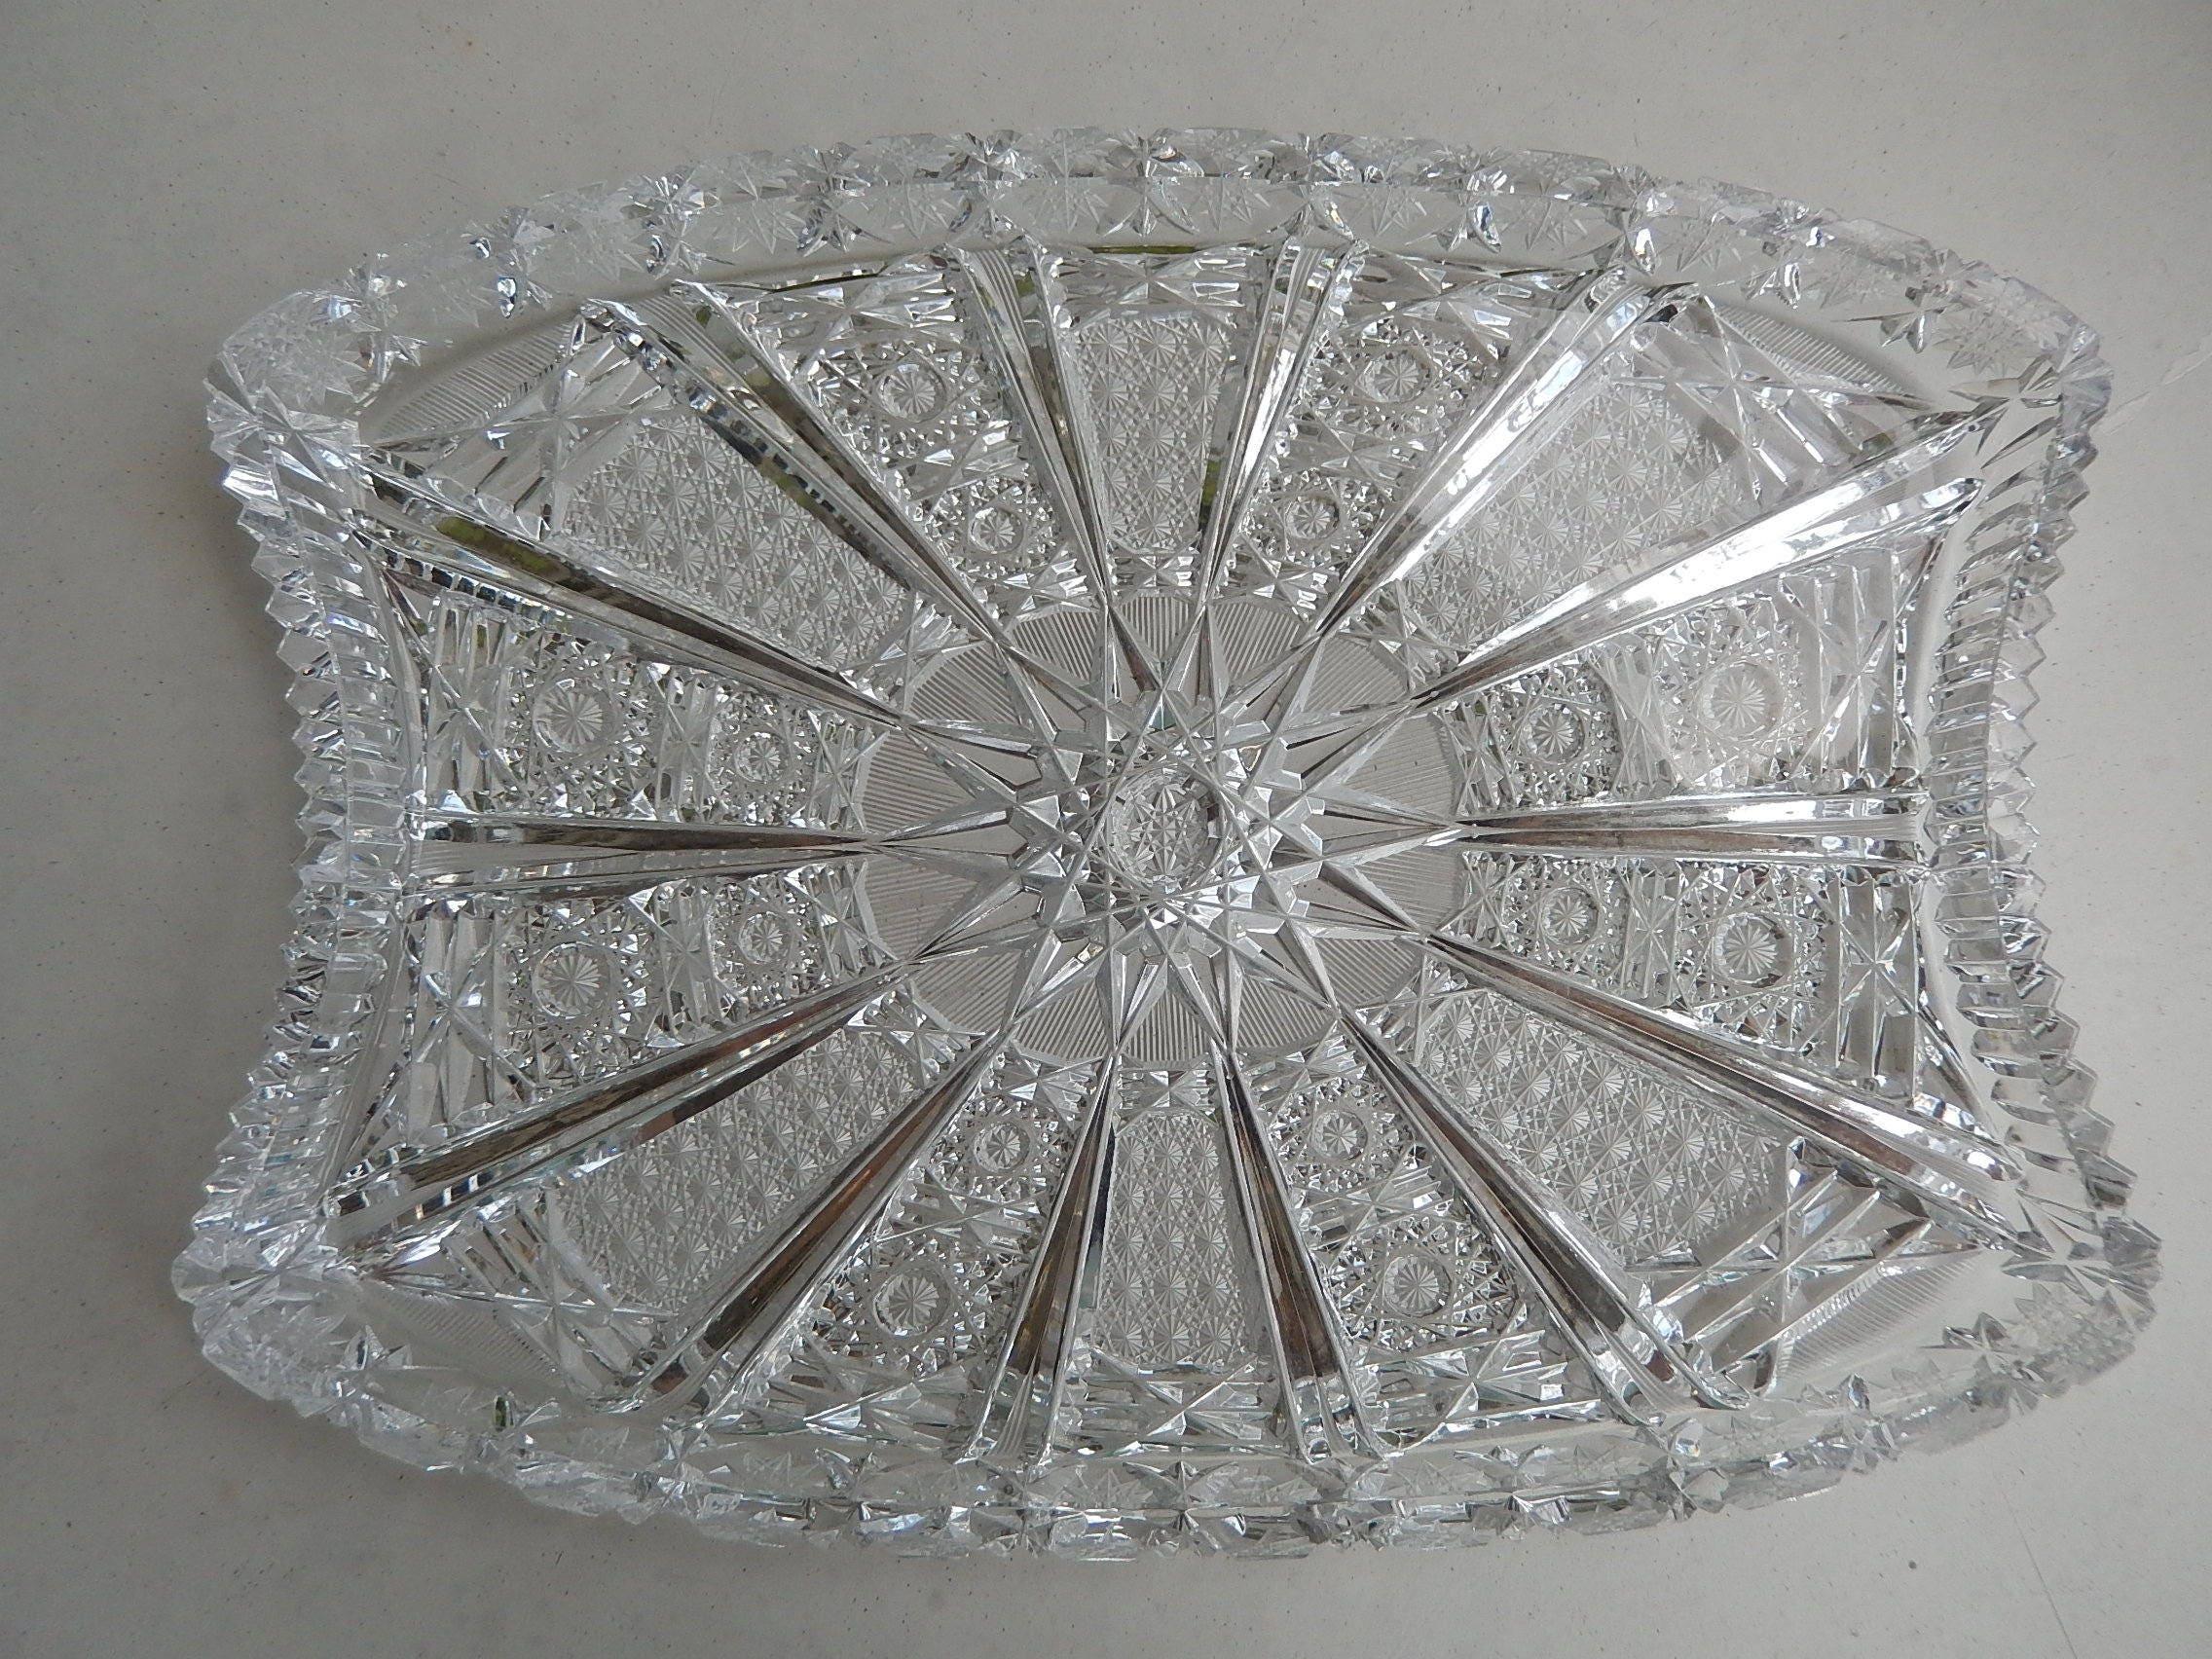 swarovski and mac tray crystal design miniature home patsy models vanity glass large ideas